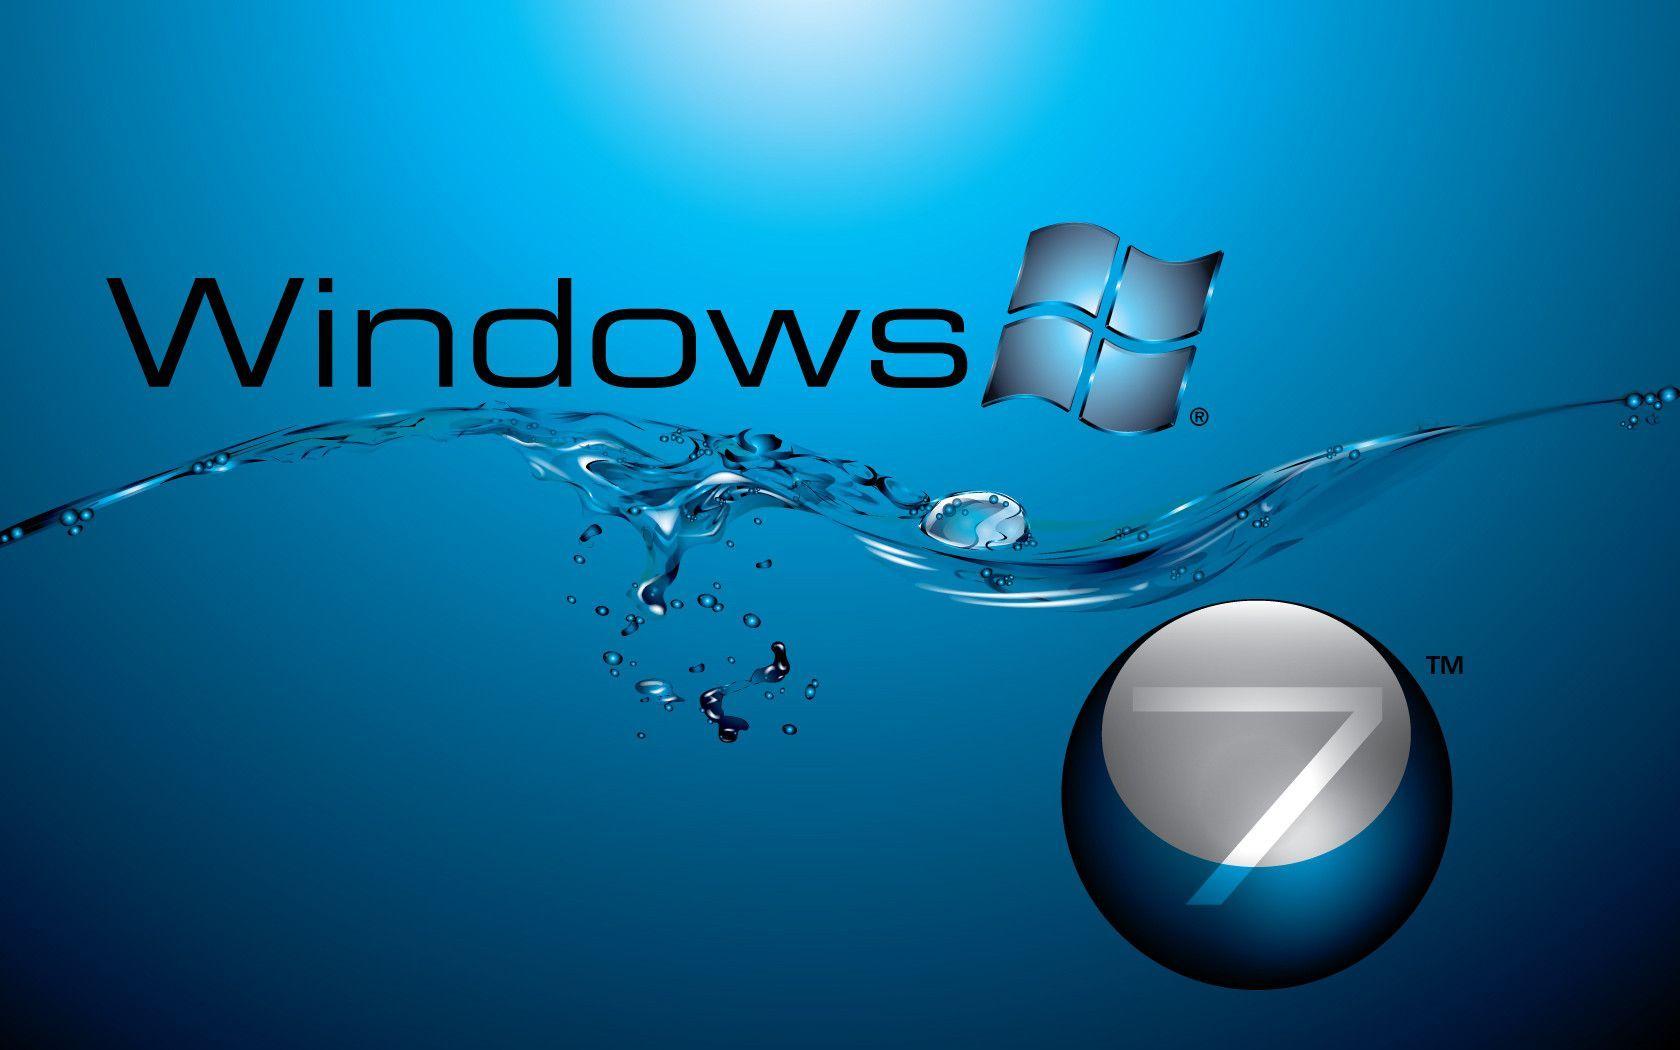 Wallpaper For Windows 10 Desktop Free